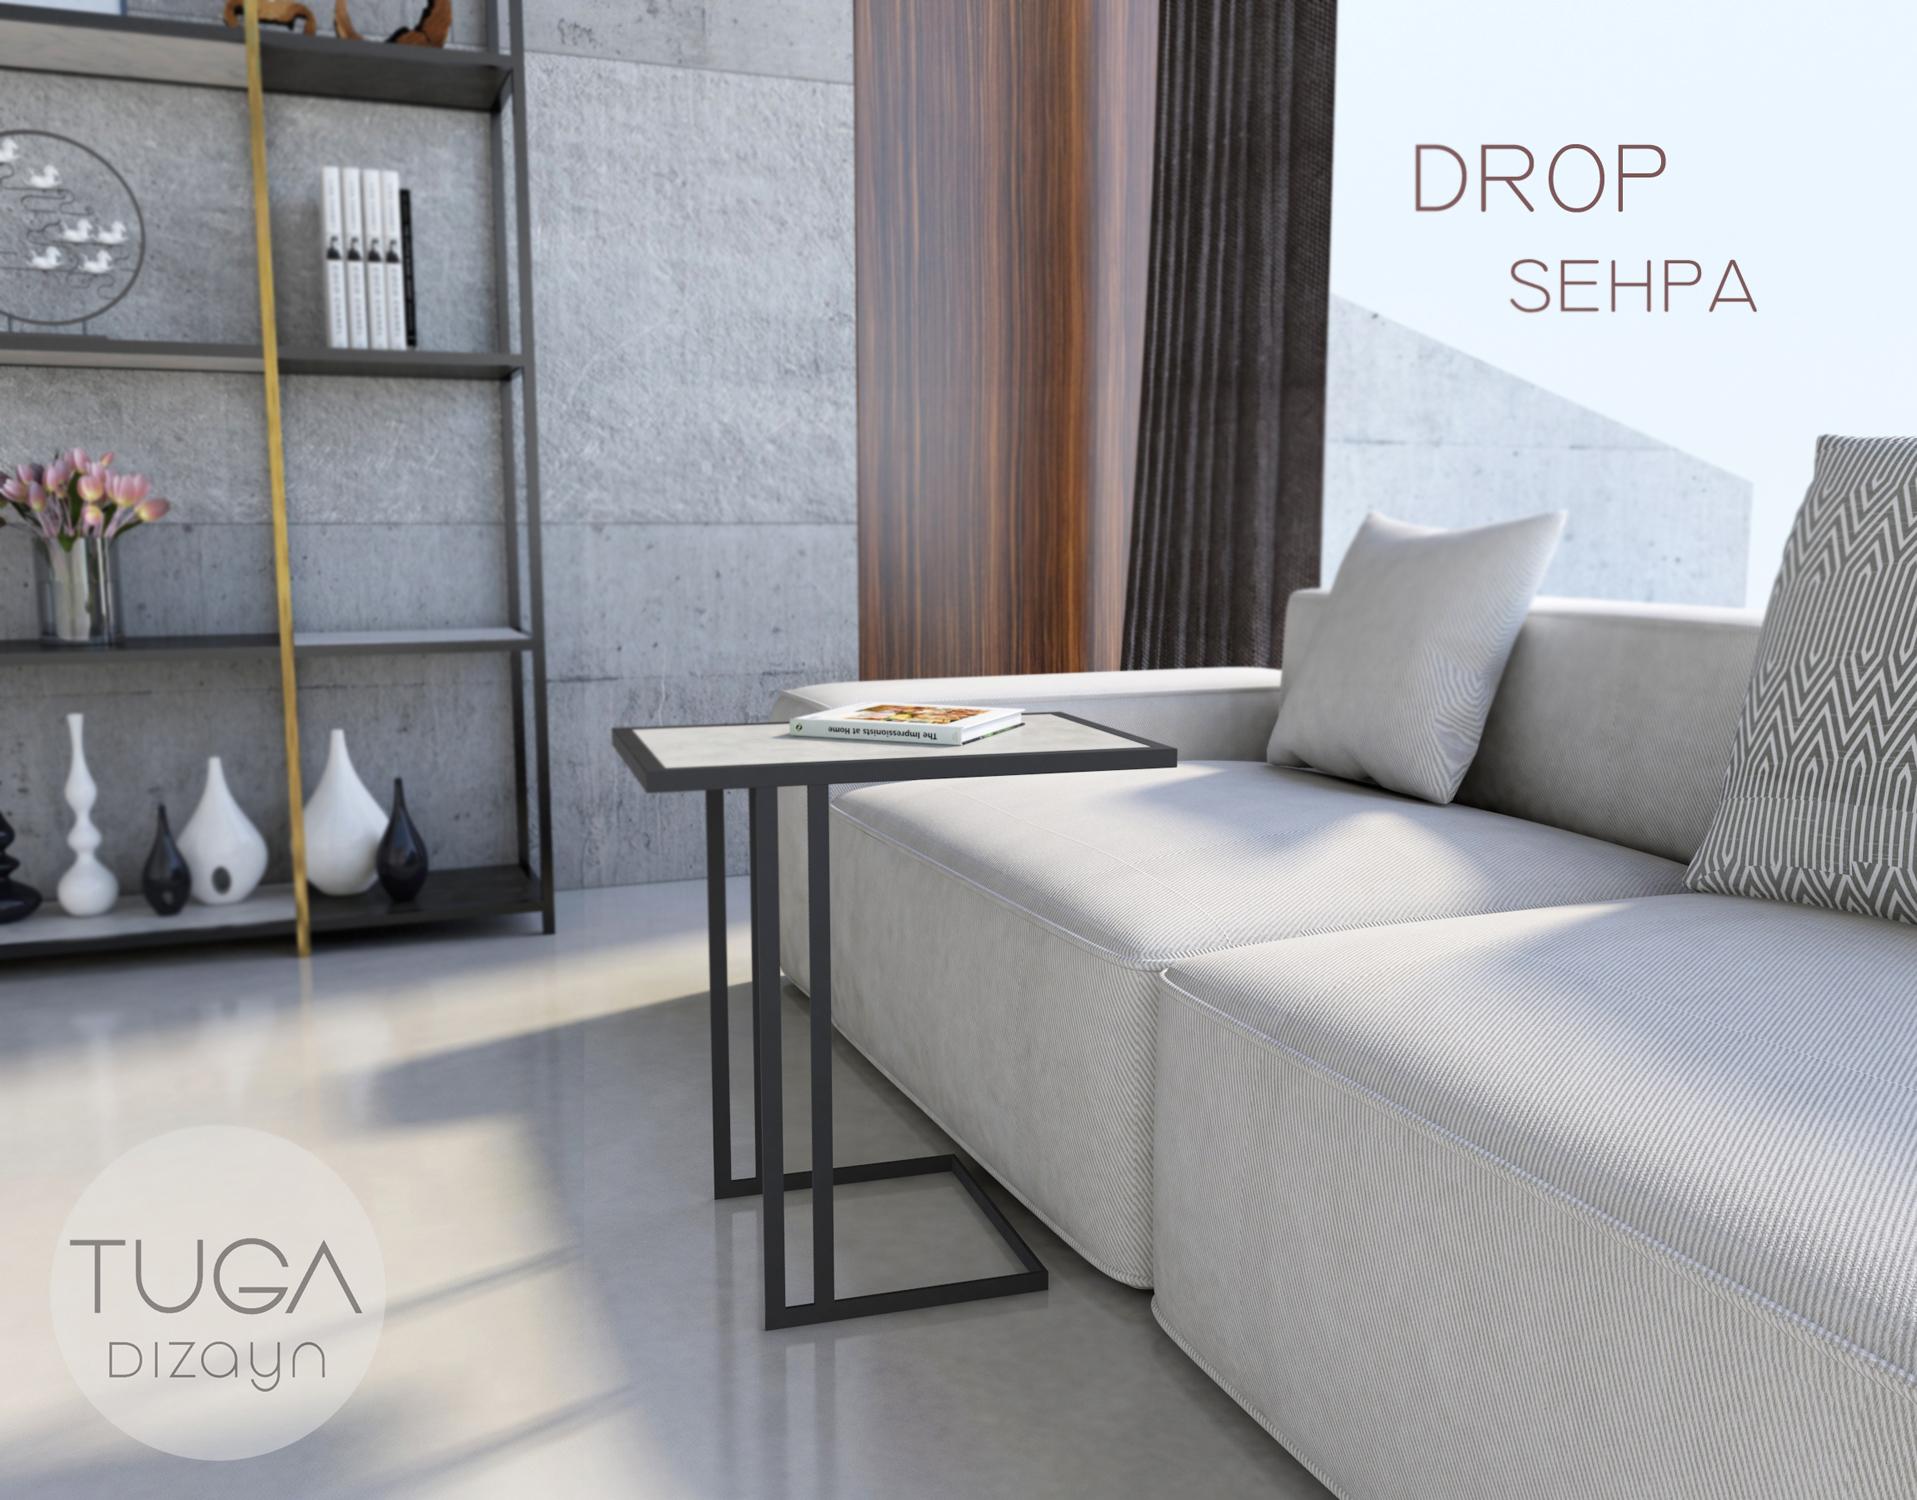 Drop Sehpa